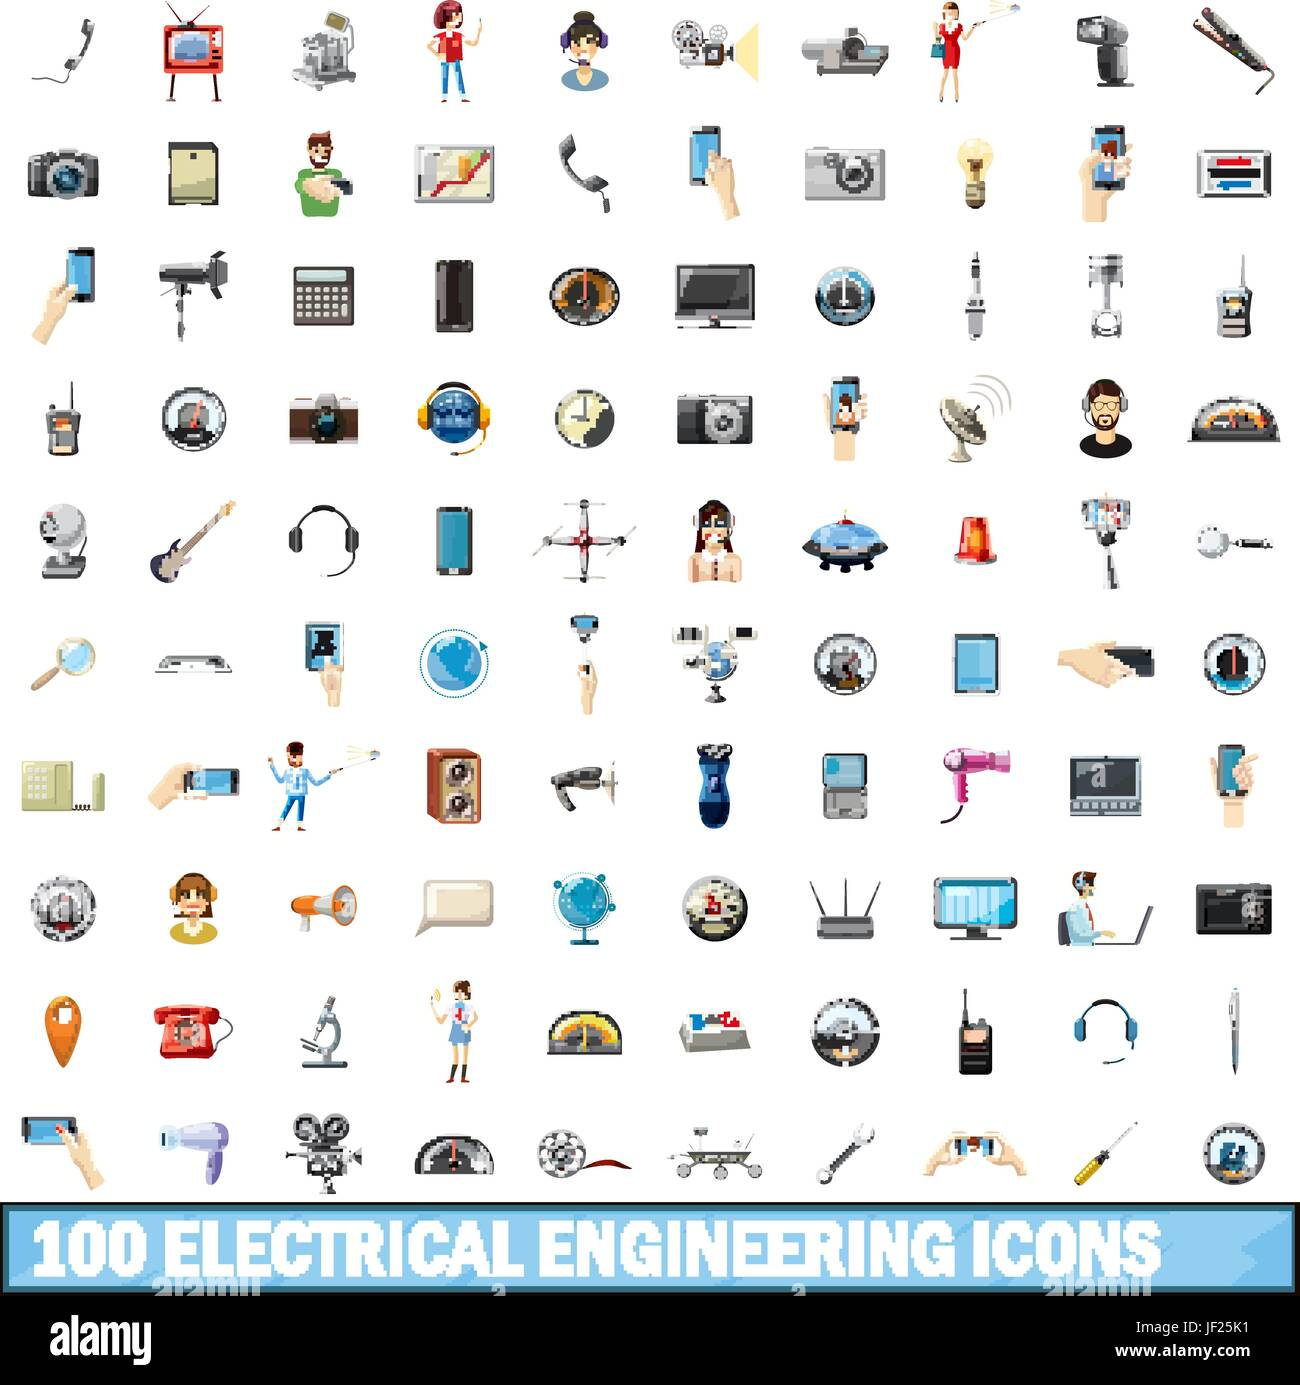 Circuit Card Stockfotos & Circuit Card Bilder - Seite 24 - Alamy